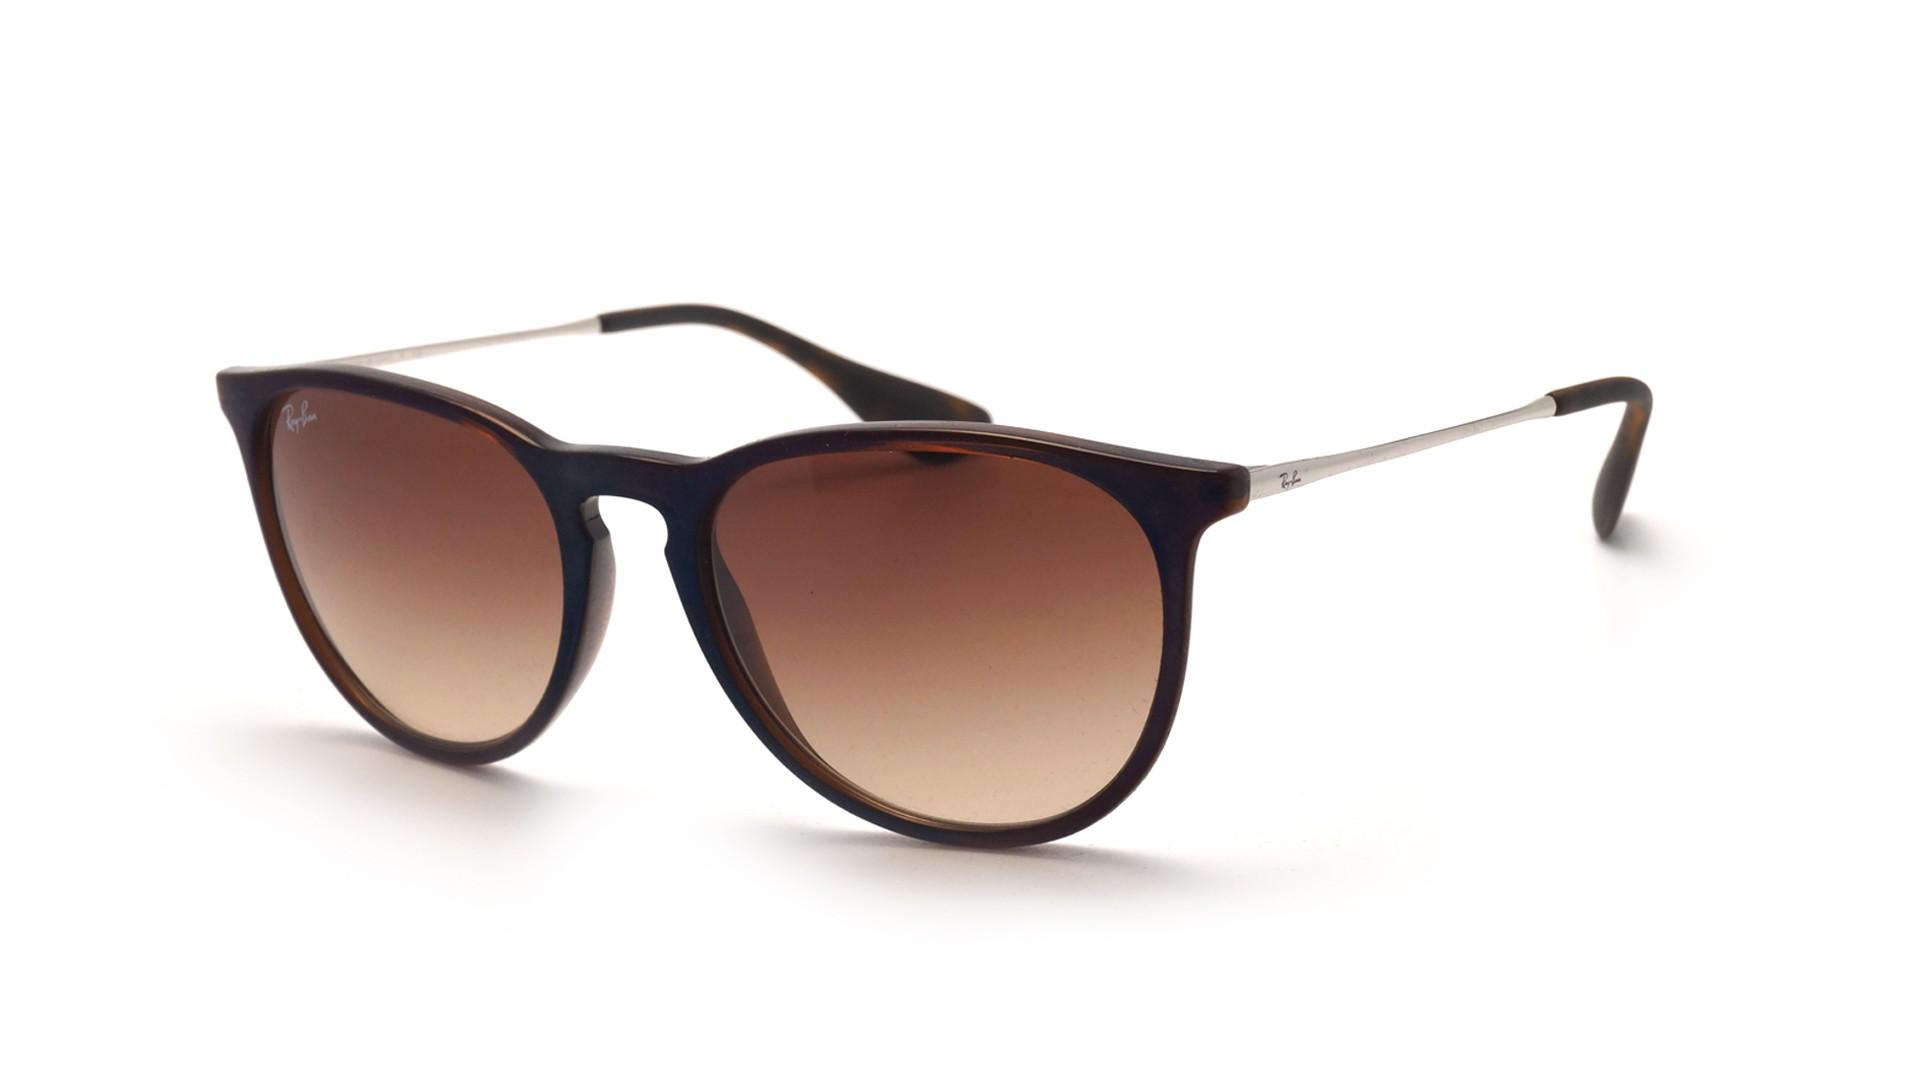 84832dd7612e8 Sunglasses Ray-Ban Erika Brown RB4171 6315 13 54-18 Medium Gradient